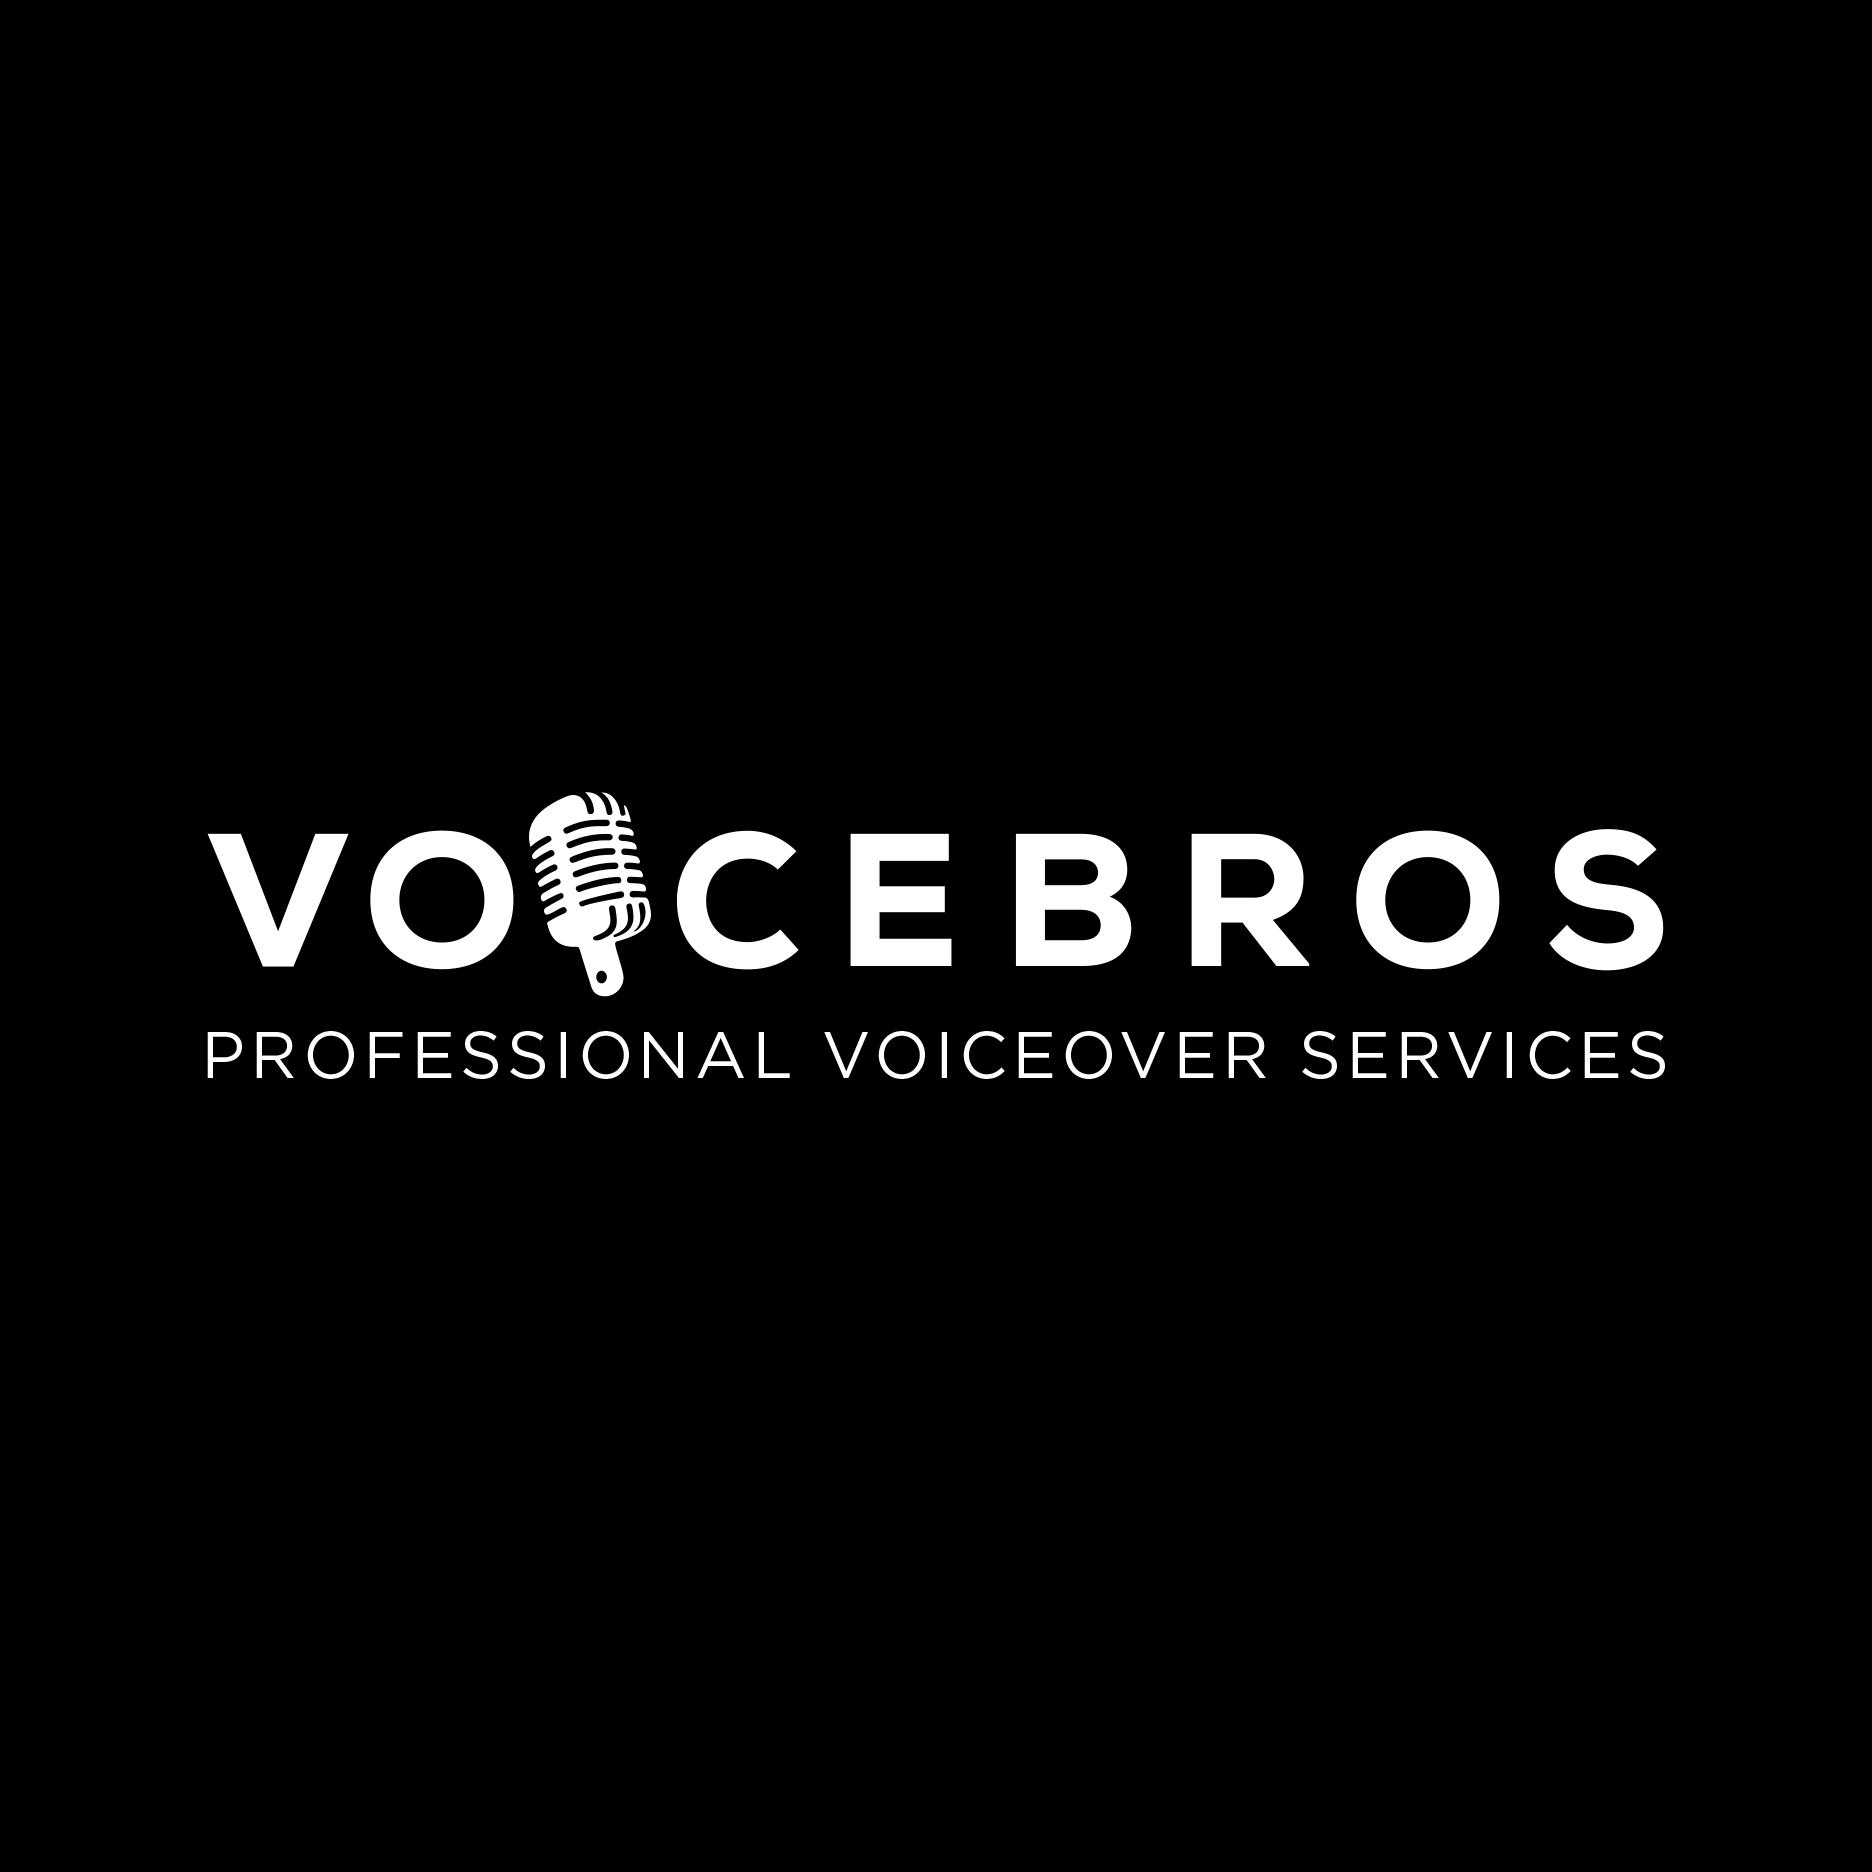 Donnah Kemunto Nyabwari is a voice over actor